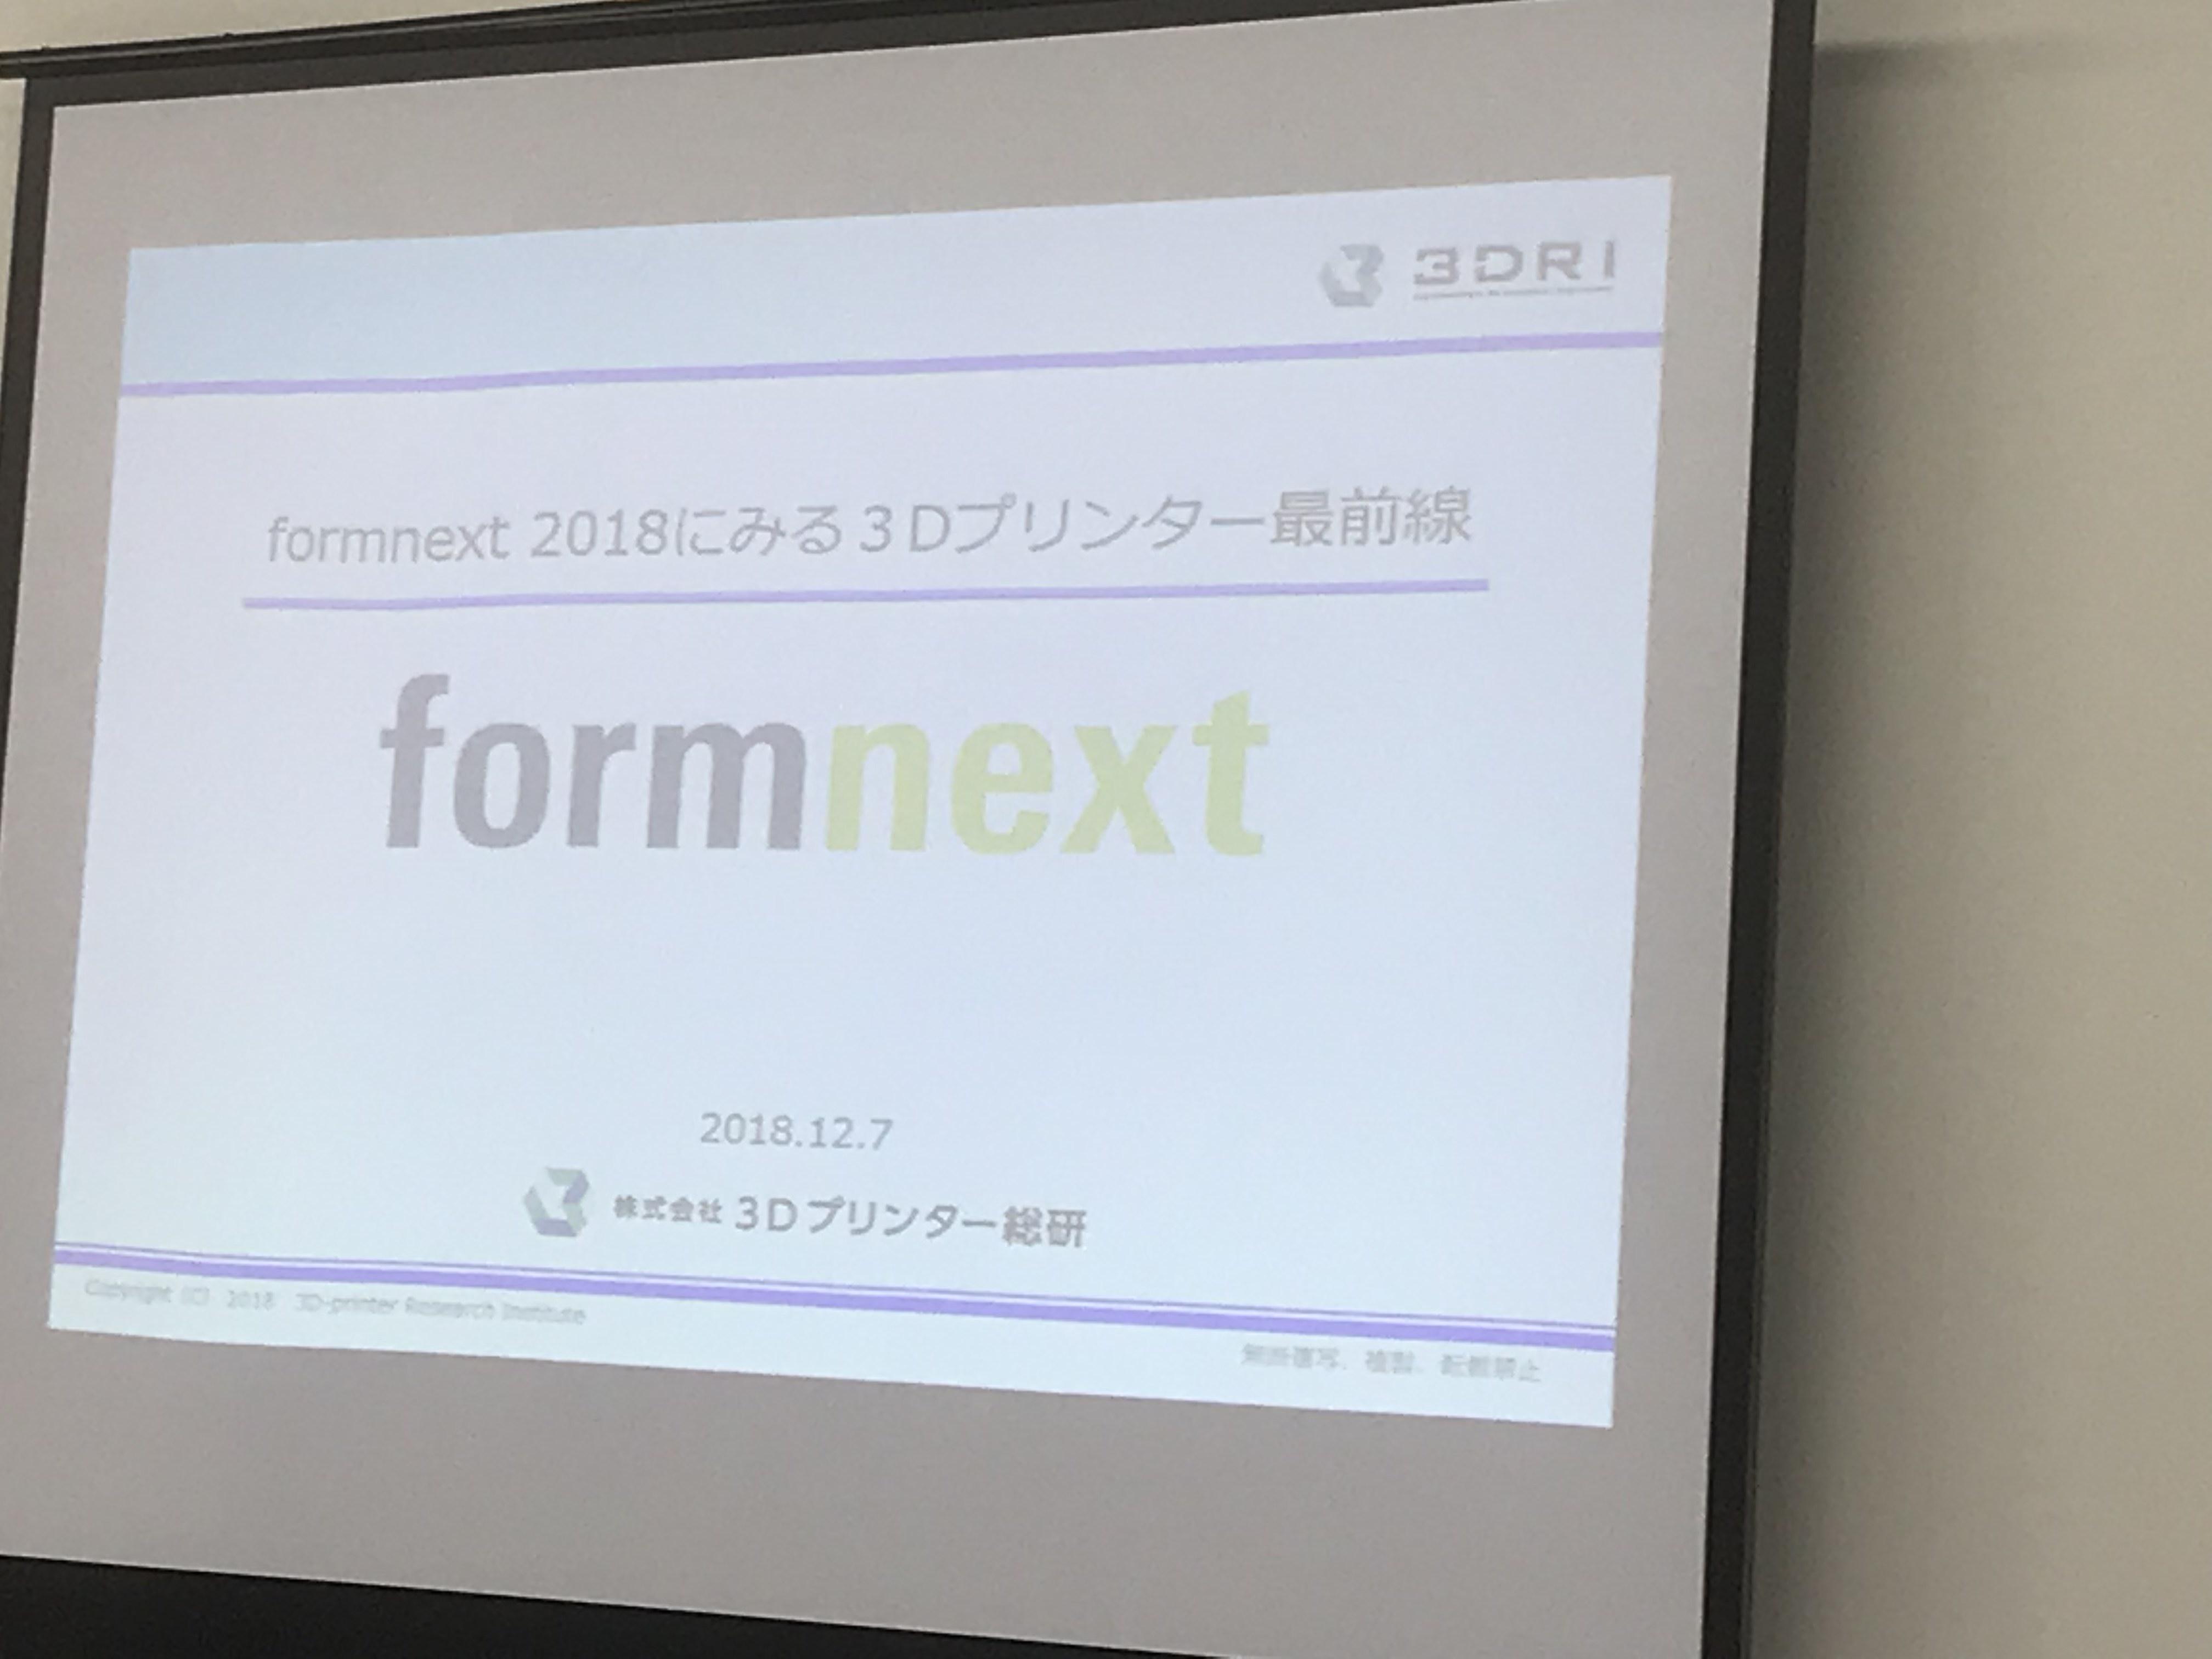 3Dプリンター総研が品川で「formnext 2018にみる3Dプリンター最前線」セミナーを開催